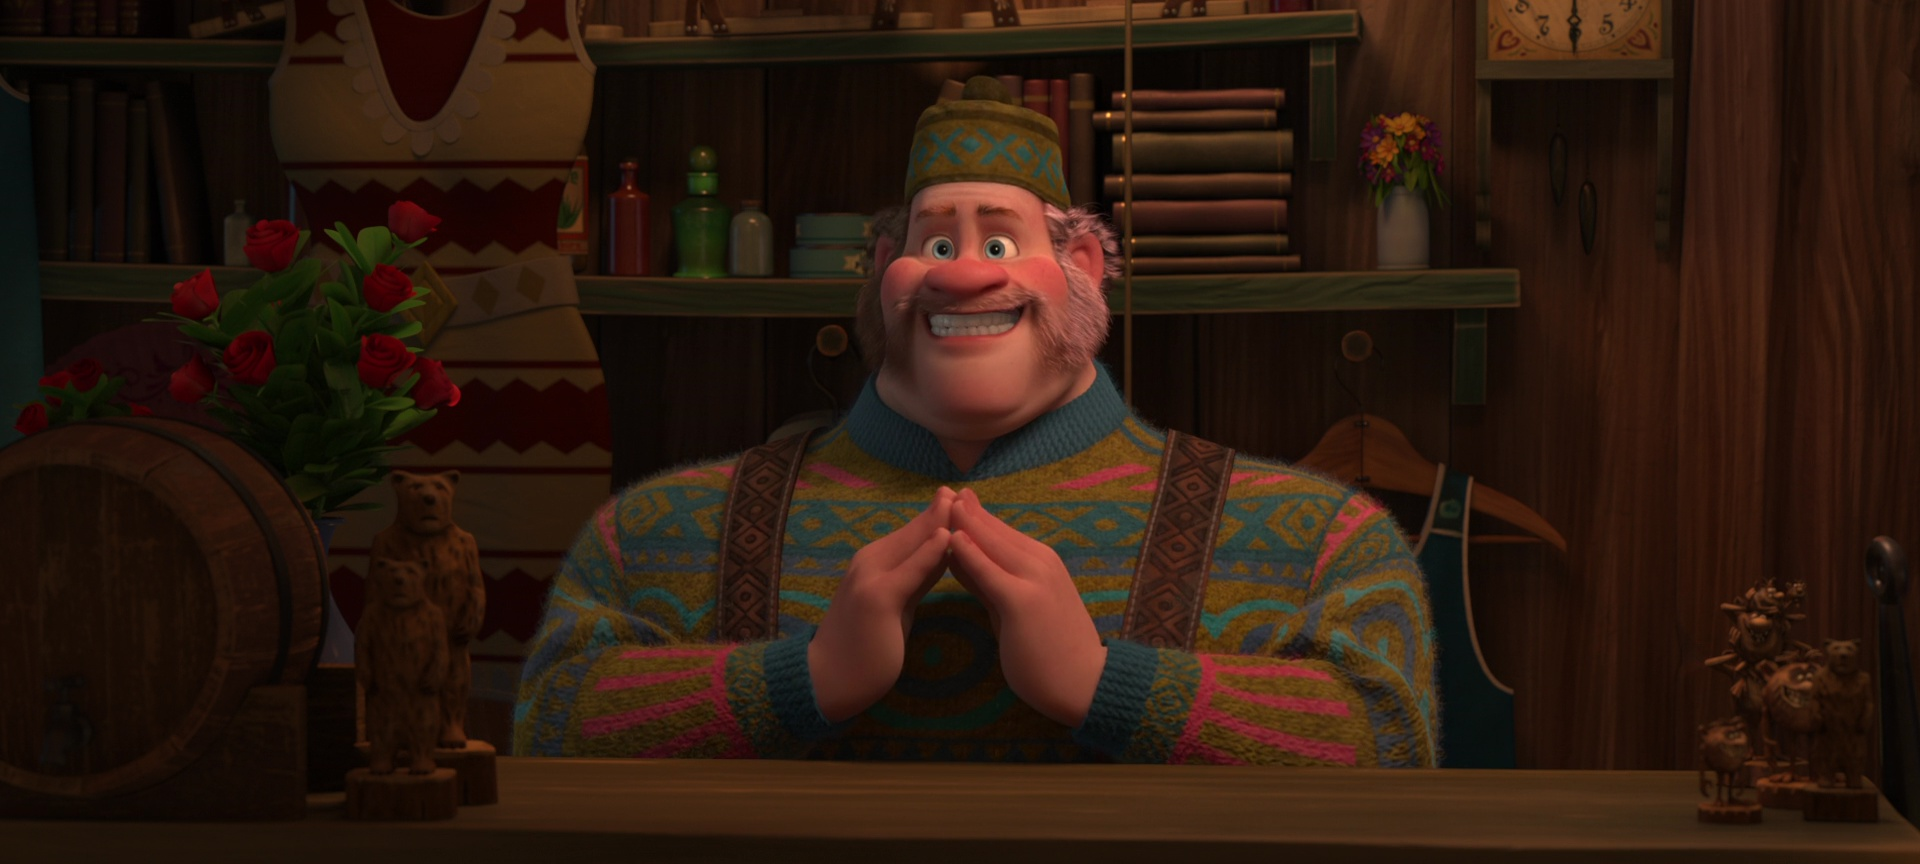 oaken personnage character disney animation reine neiges frozen